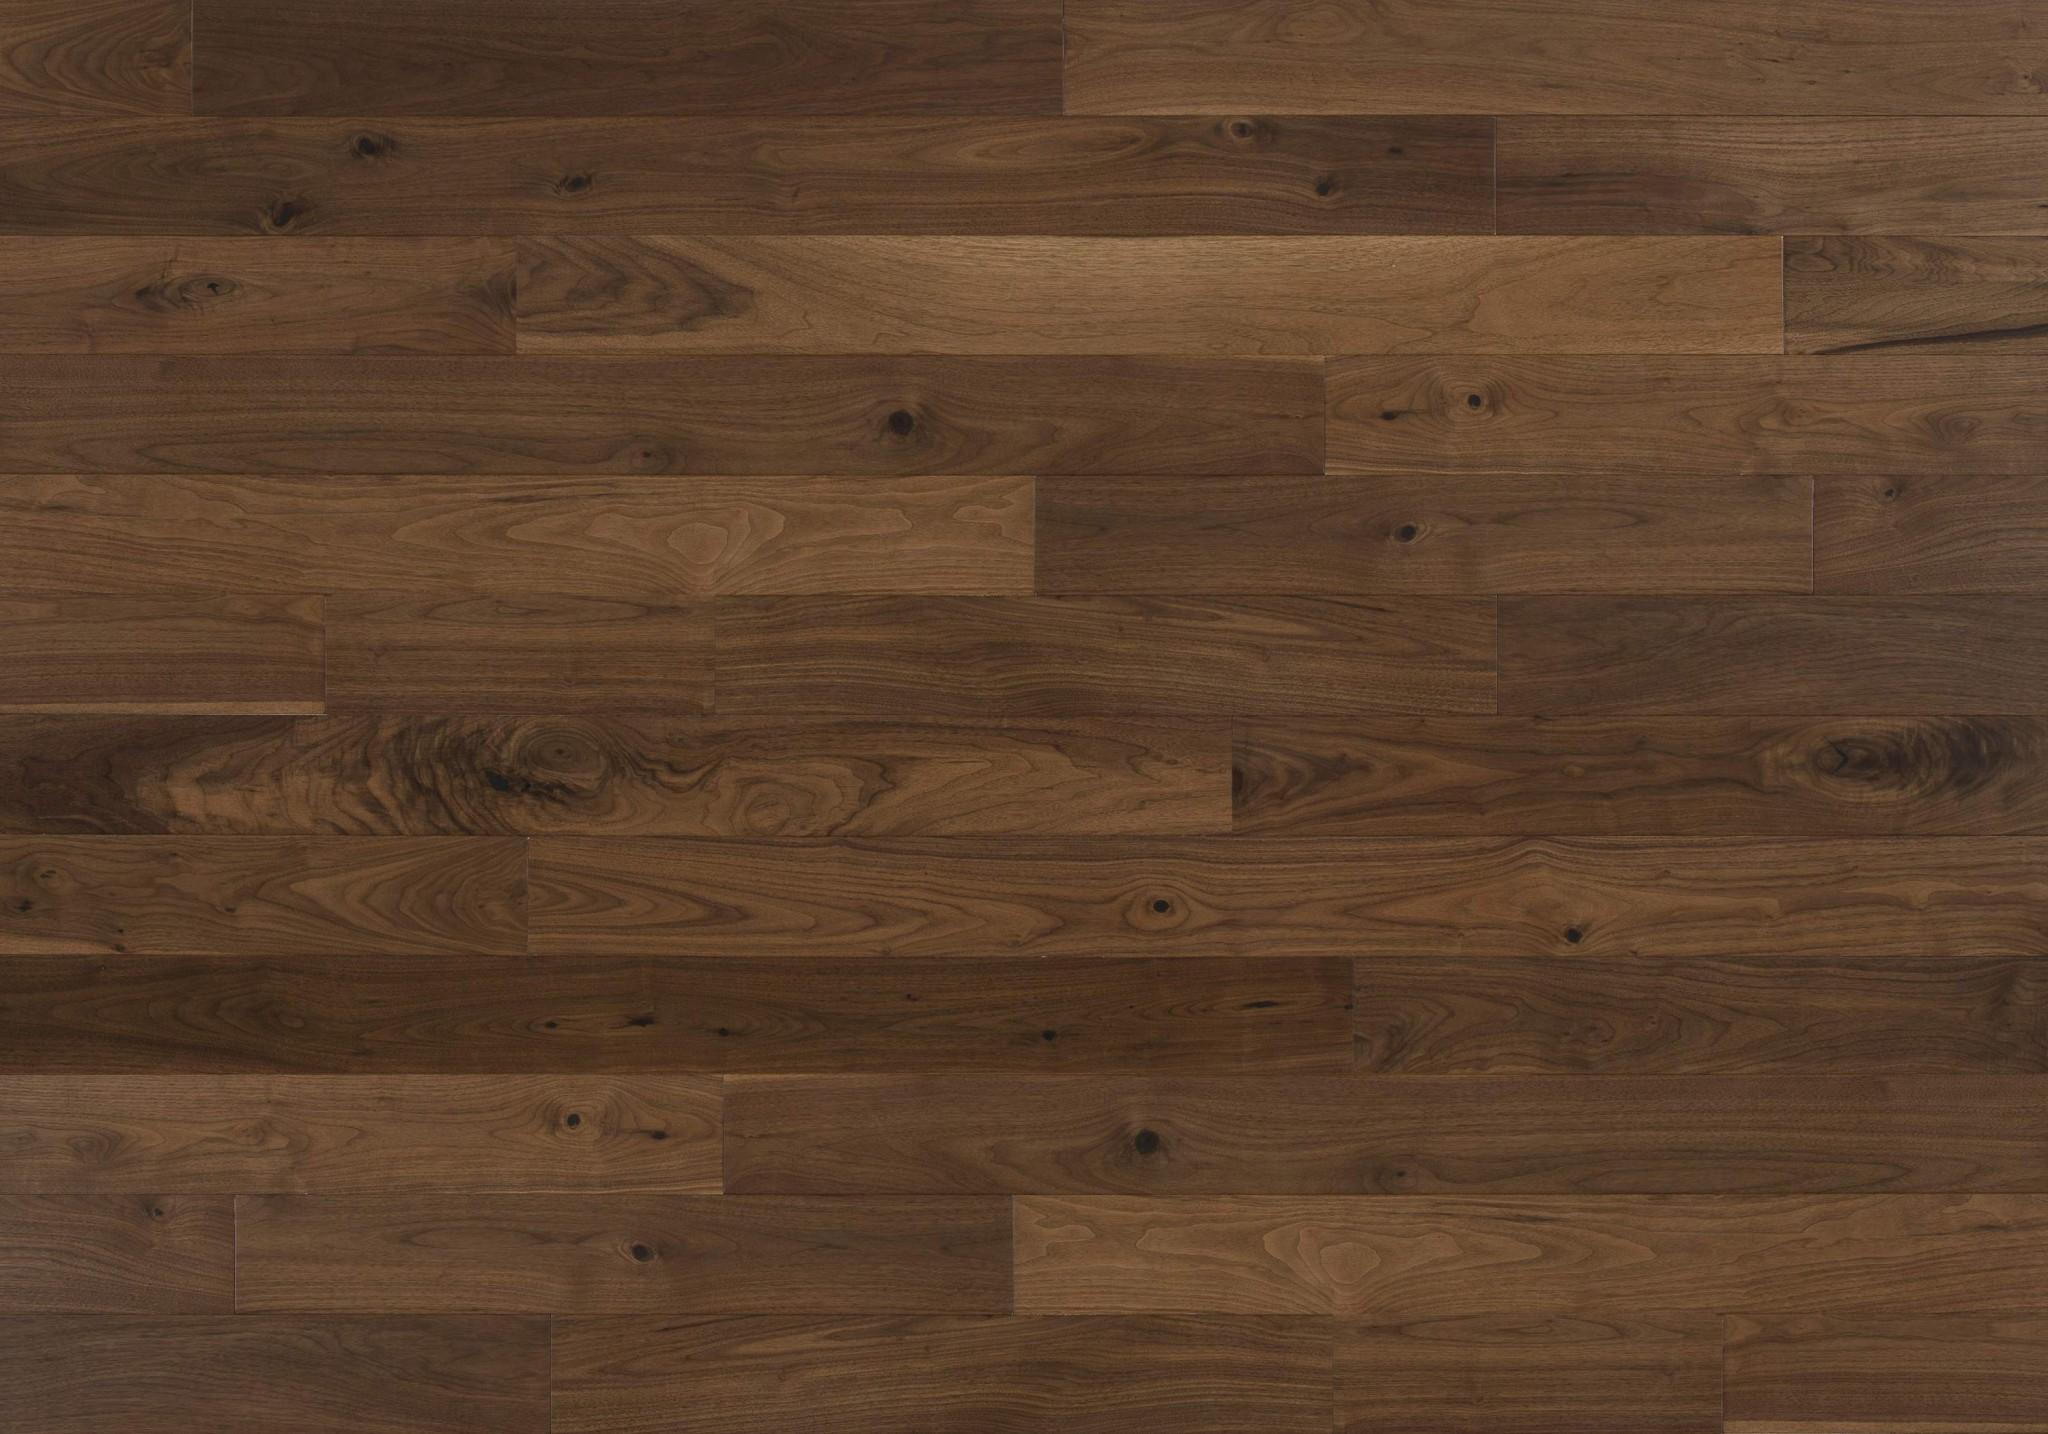 walnut floors black walnut hardwood flooring brown country side homestead designer lauzon JIQLXGK